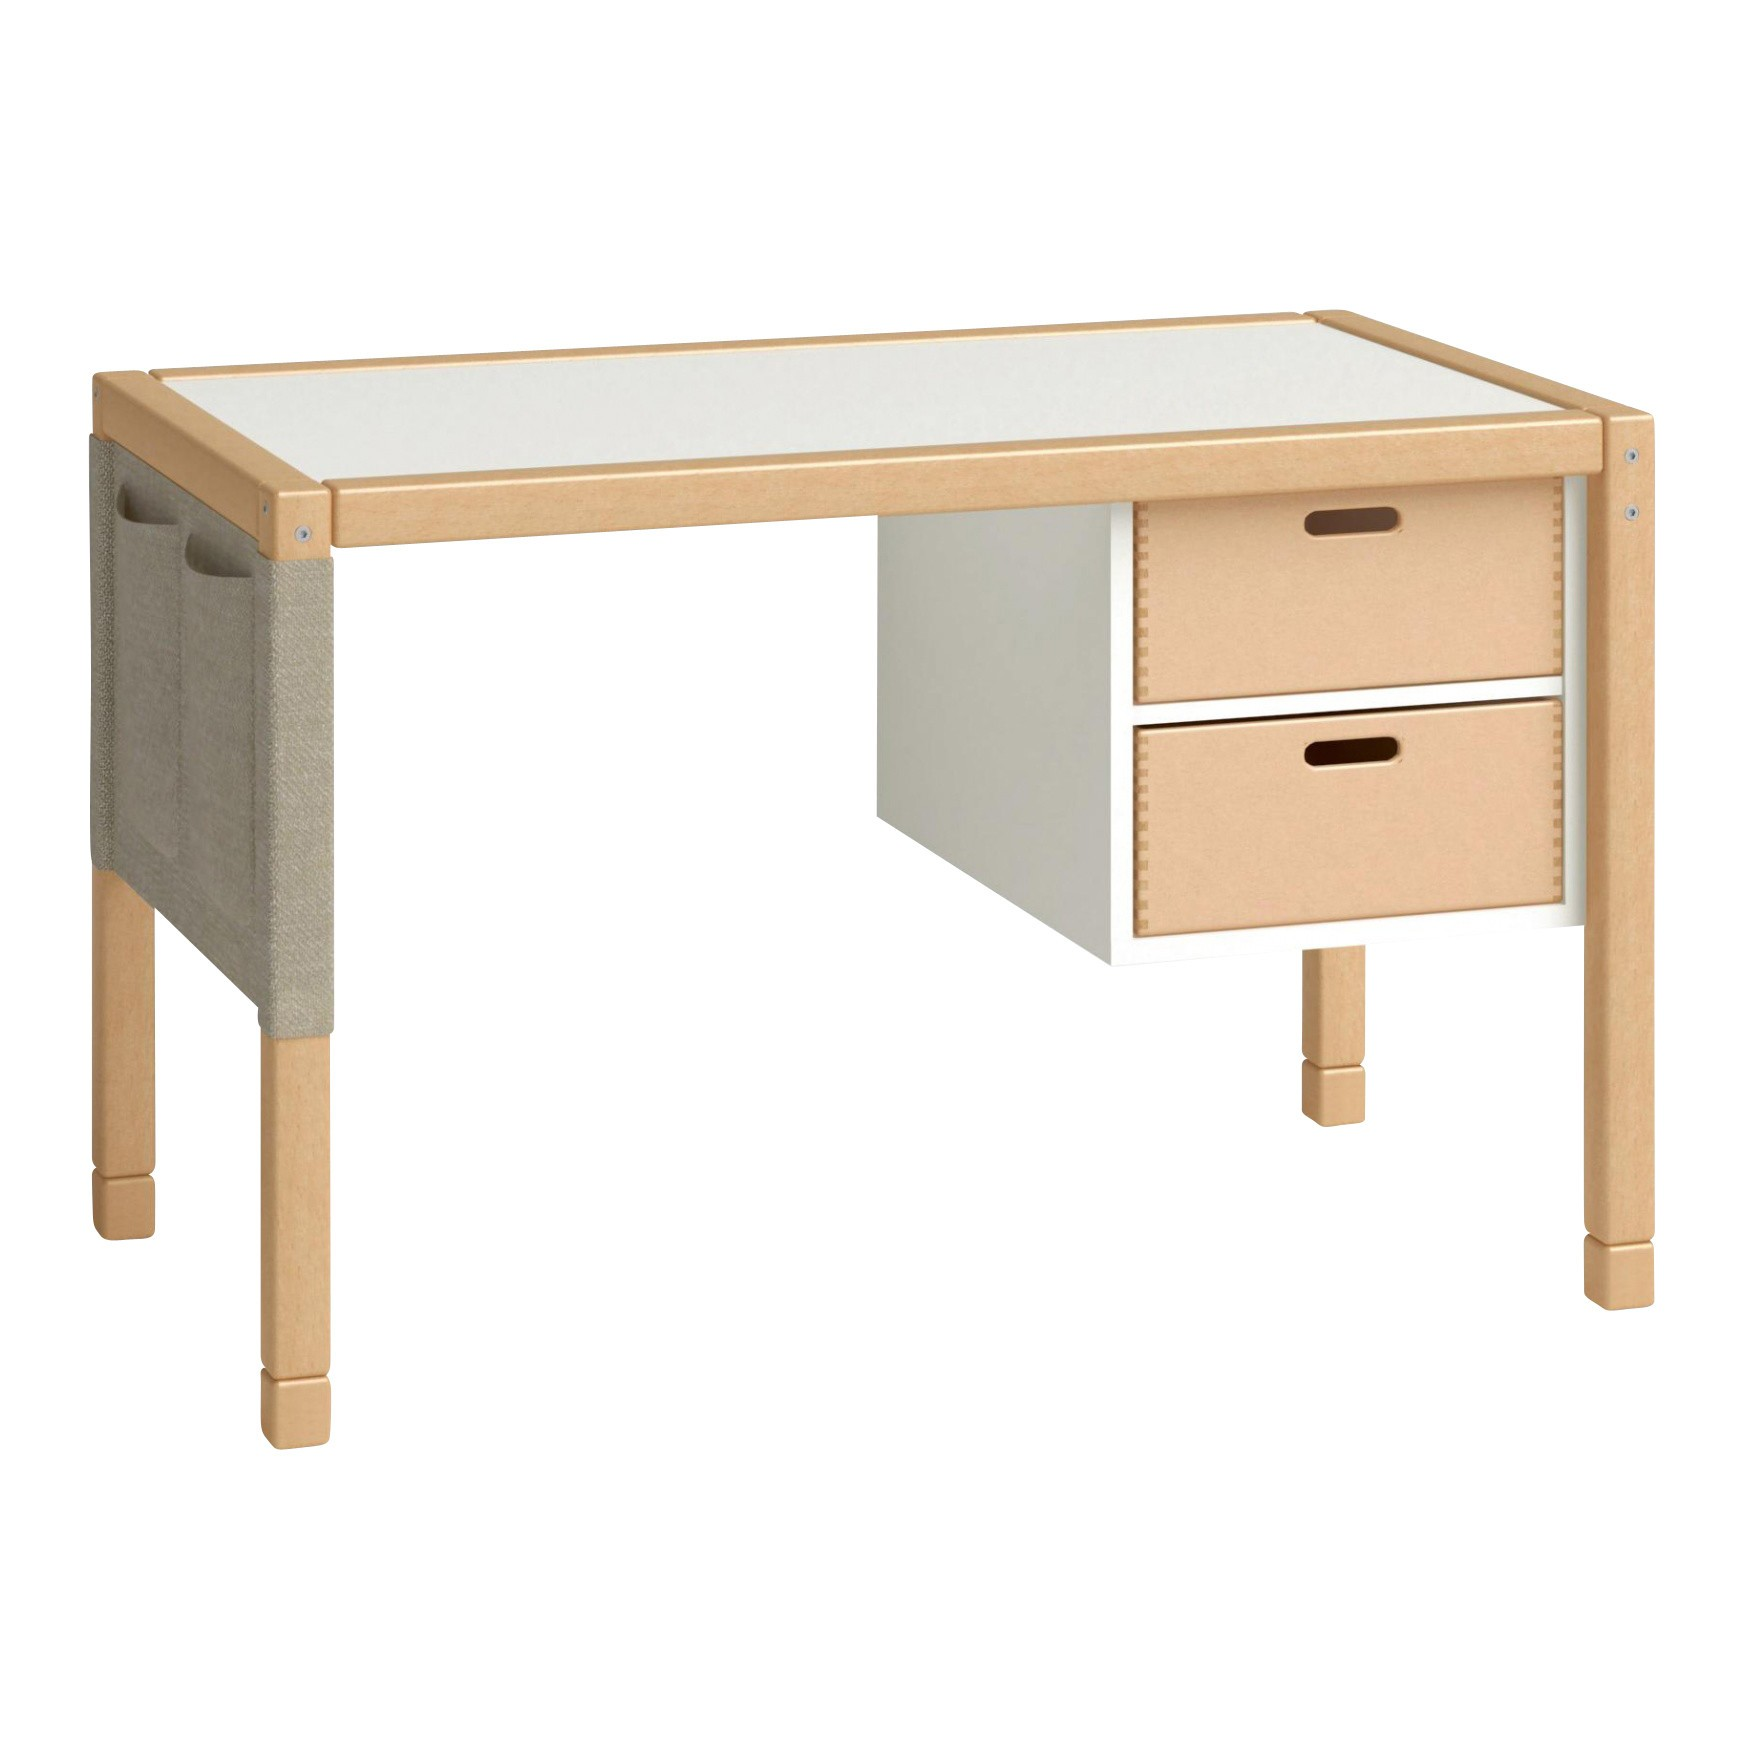 Flötotto Profilsystem Junior Office Table Beech Top White Melamine Resin